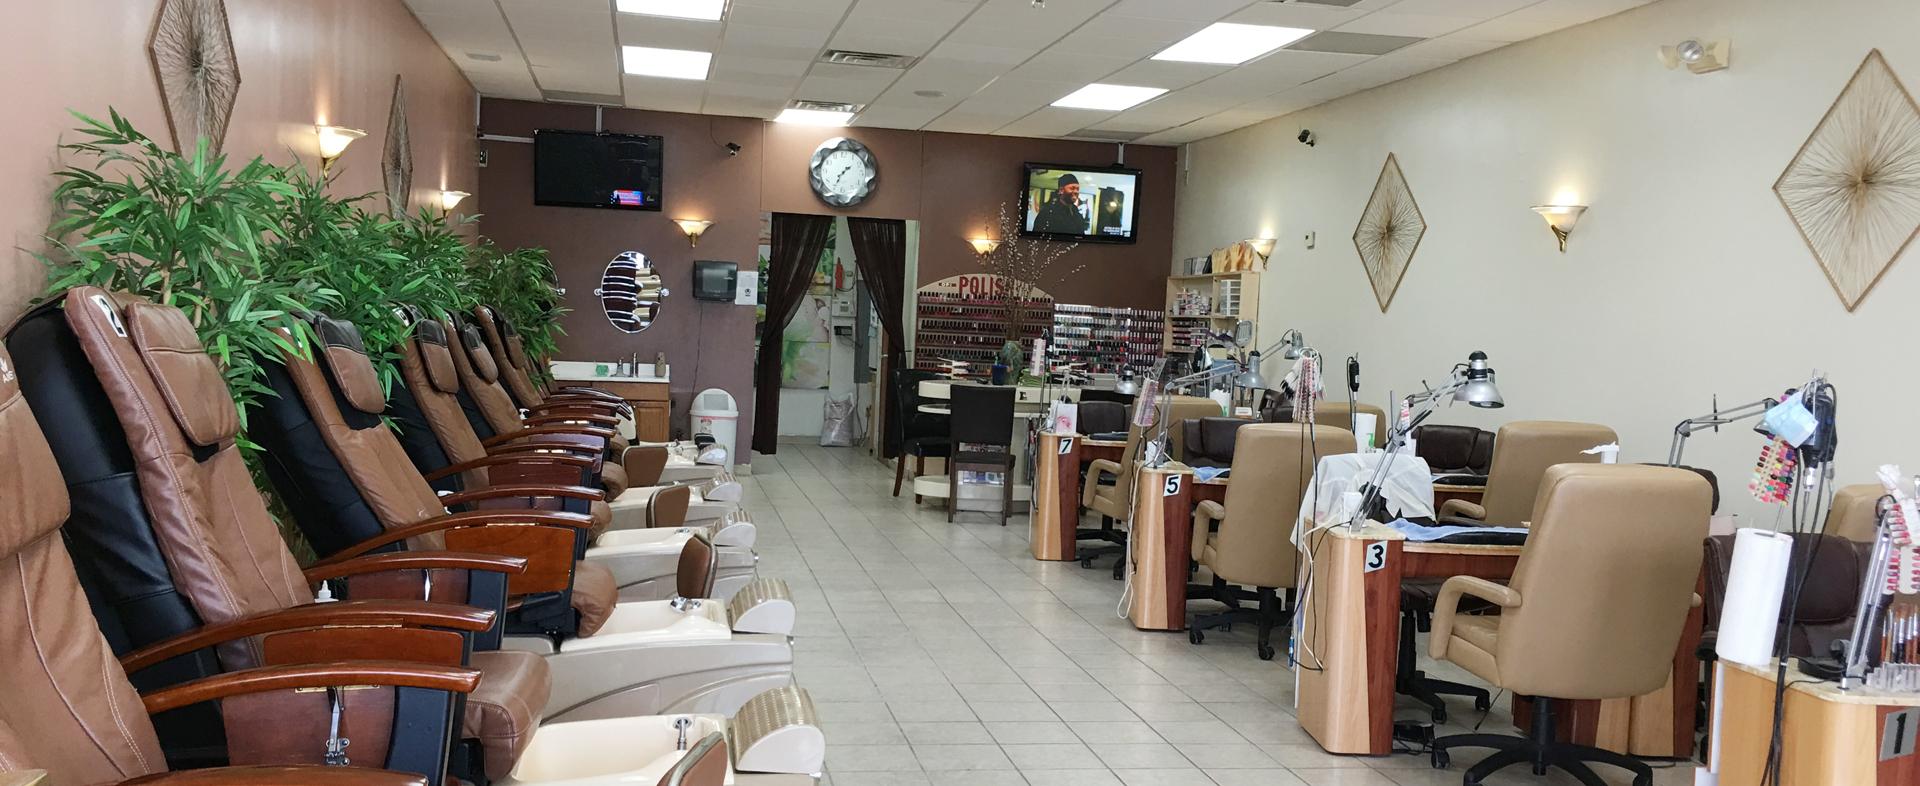 Maple Nails - Nail salon in Omaha, Nebraska 68116